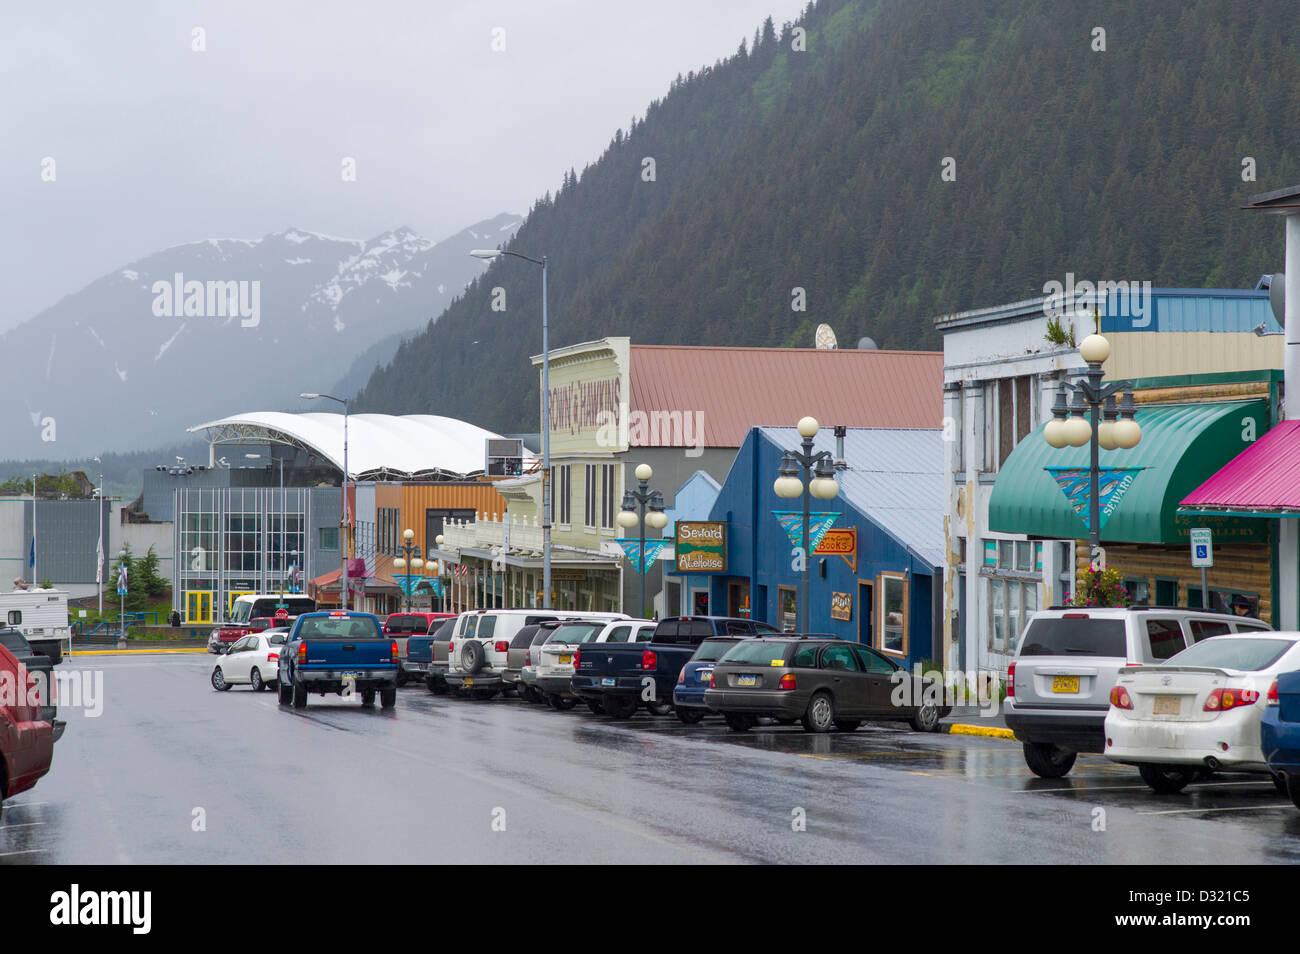 Rainy day in downtown, Seward, Alaska, USA - Stock Image